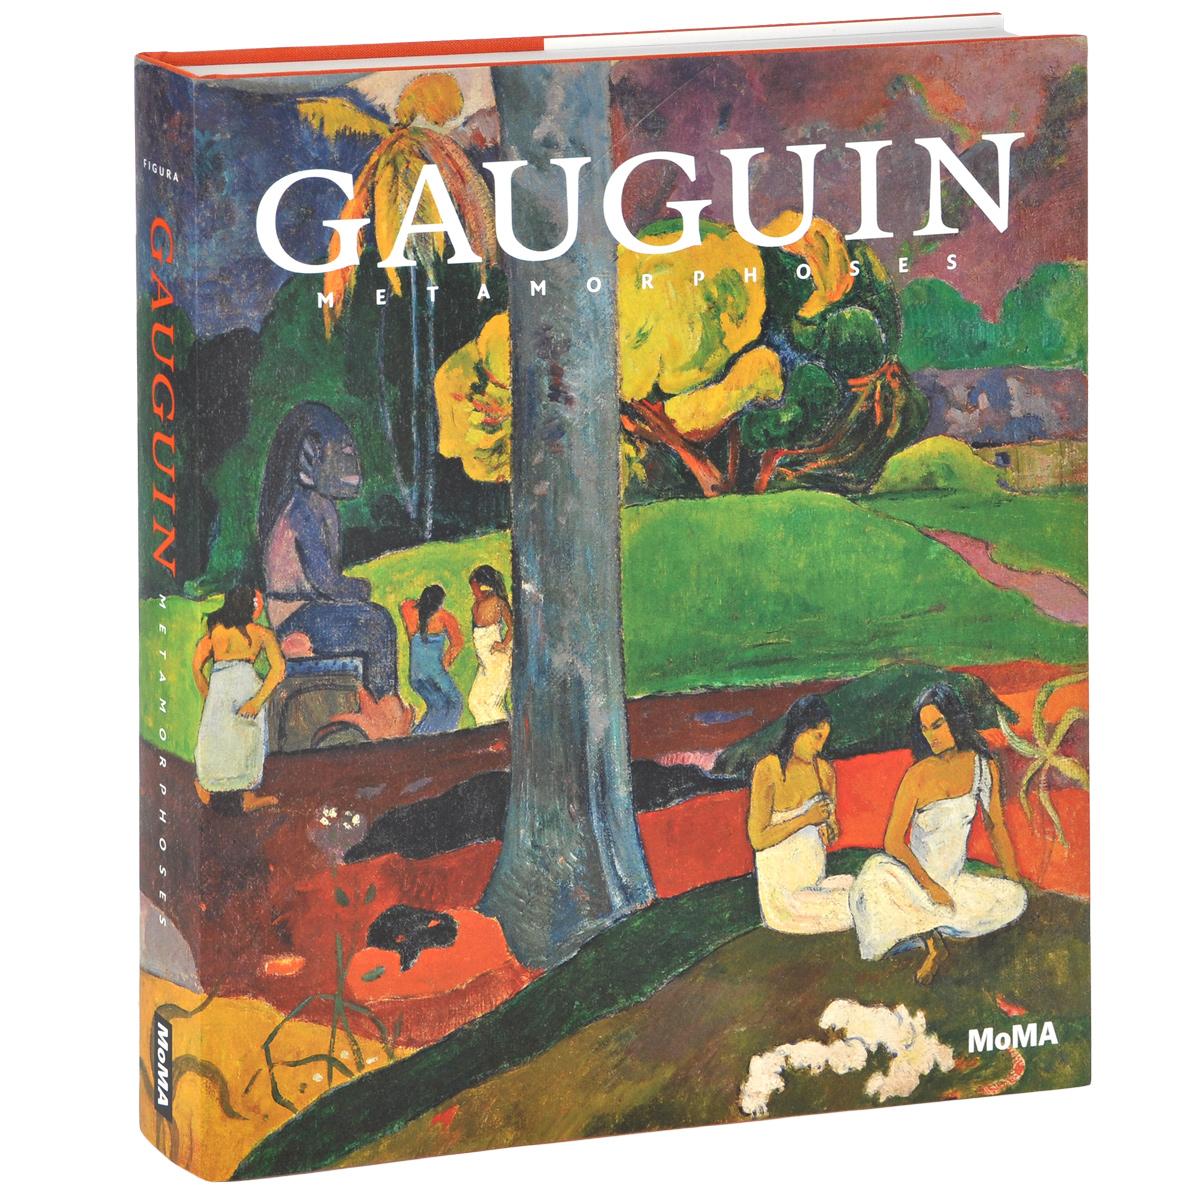 Gauguin: Metamorphoses metamorphoses